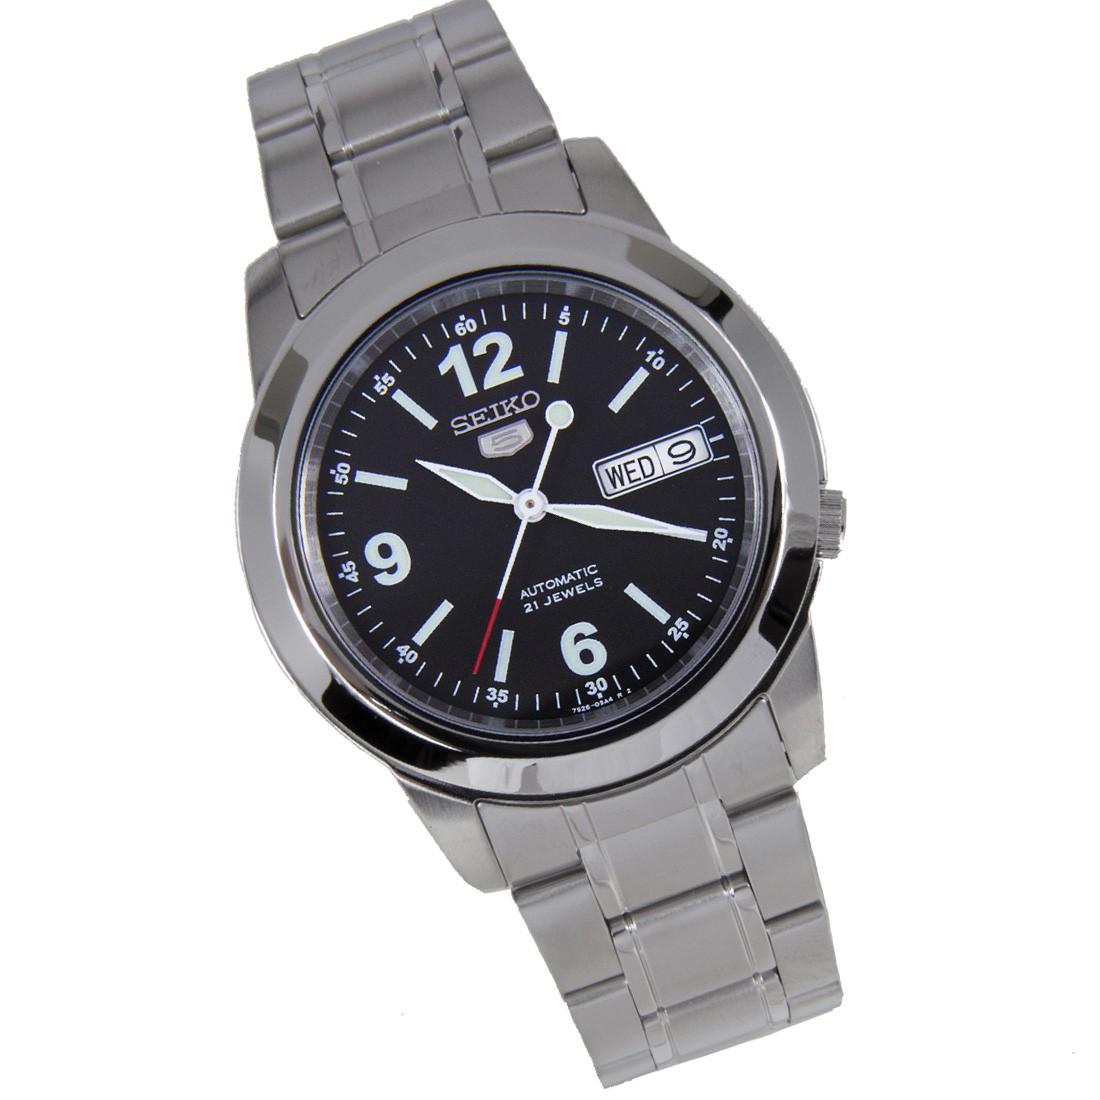 Đồng hồ seiko SNKE63K1 (7)